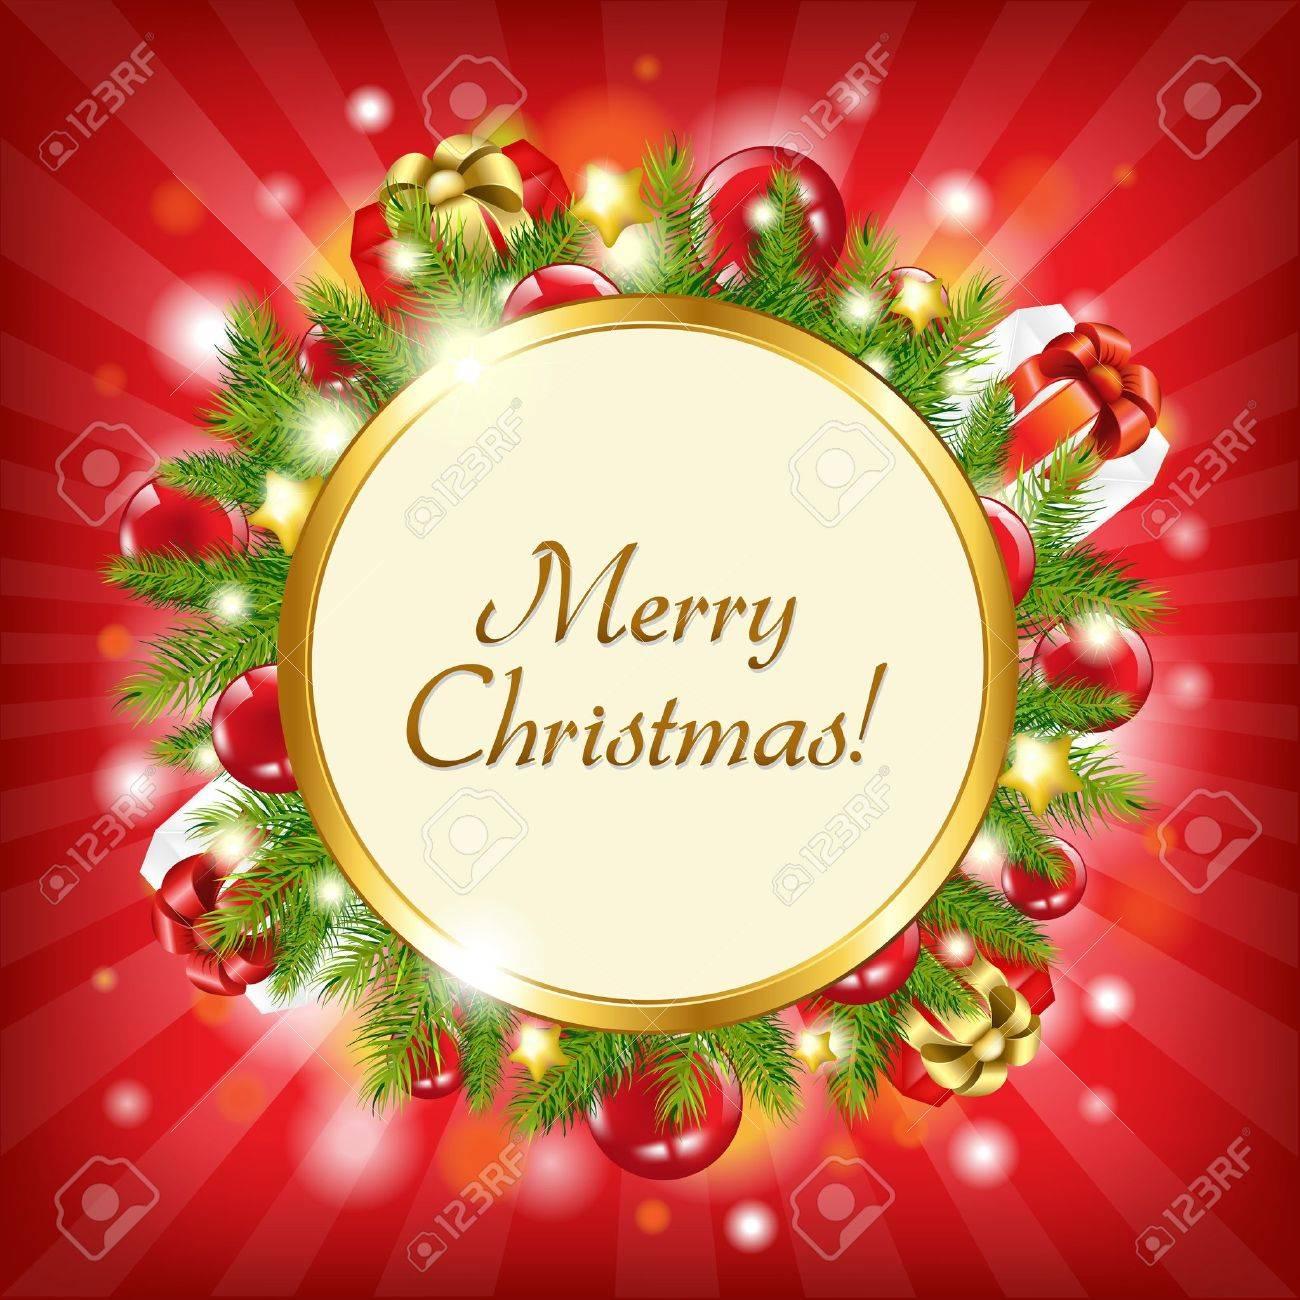 Merry Christmas Card, Vector Illustration Stock Vector - 11271613